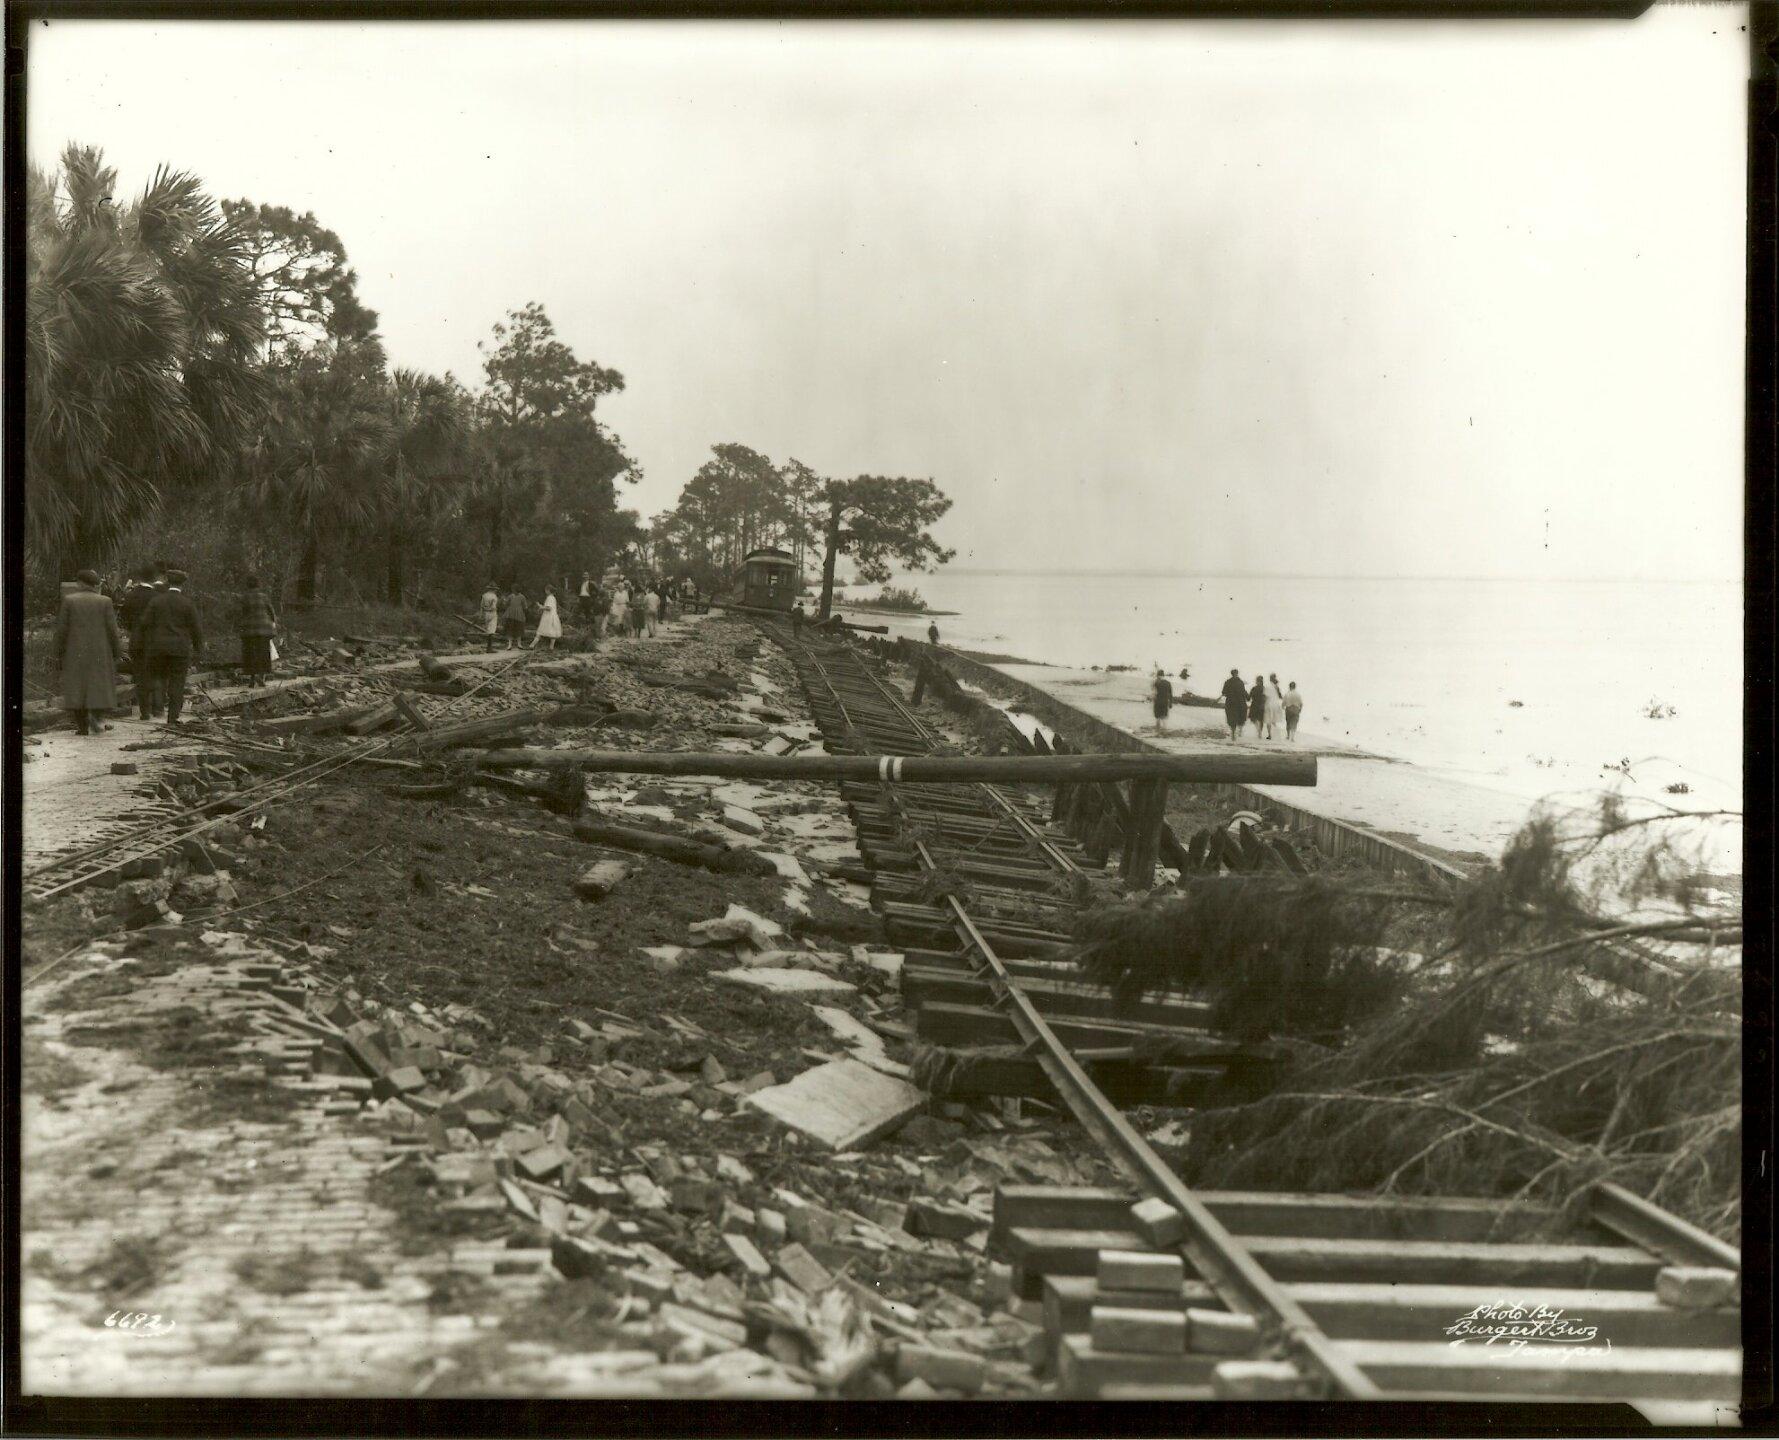 tbhc - 1921 hurricane - bayshore near ballast point.jpg